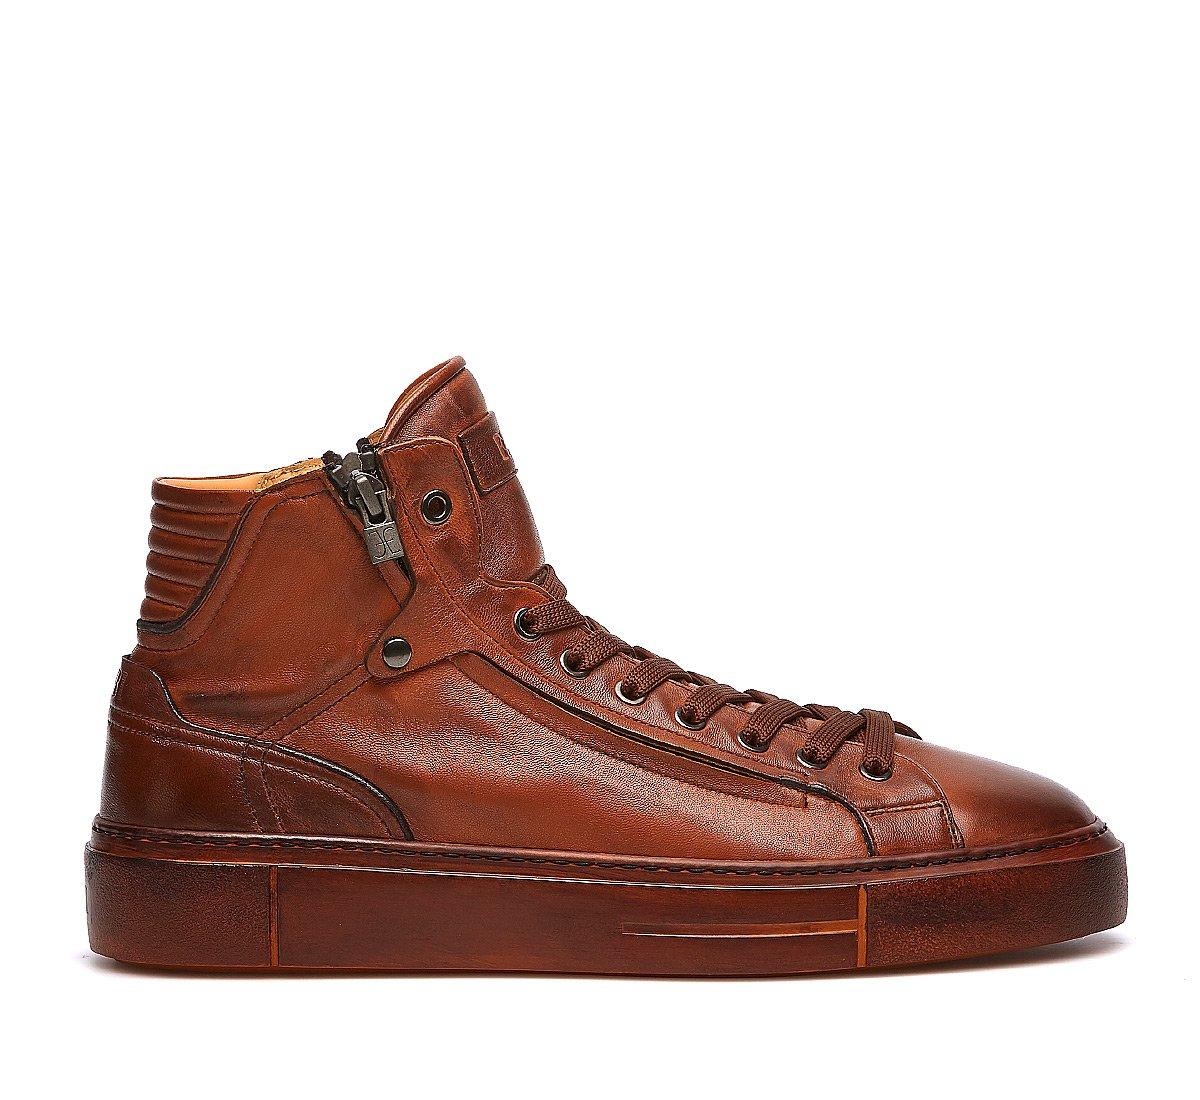 Fabi Rainier sneakers